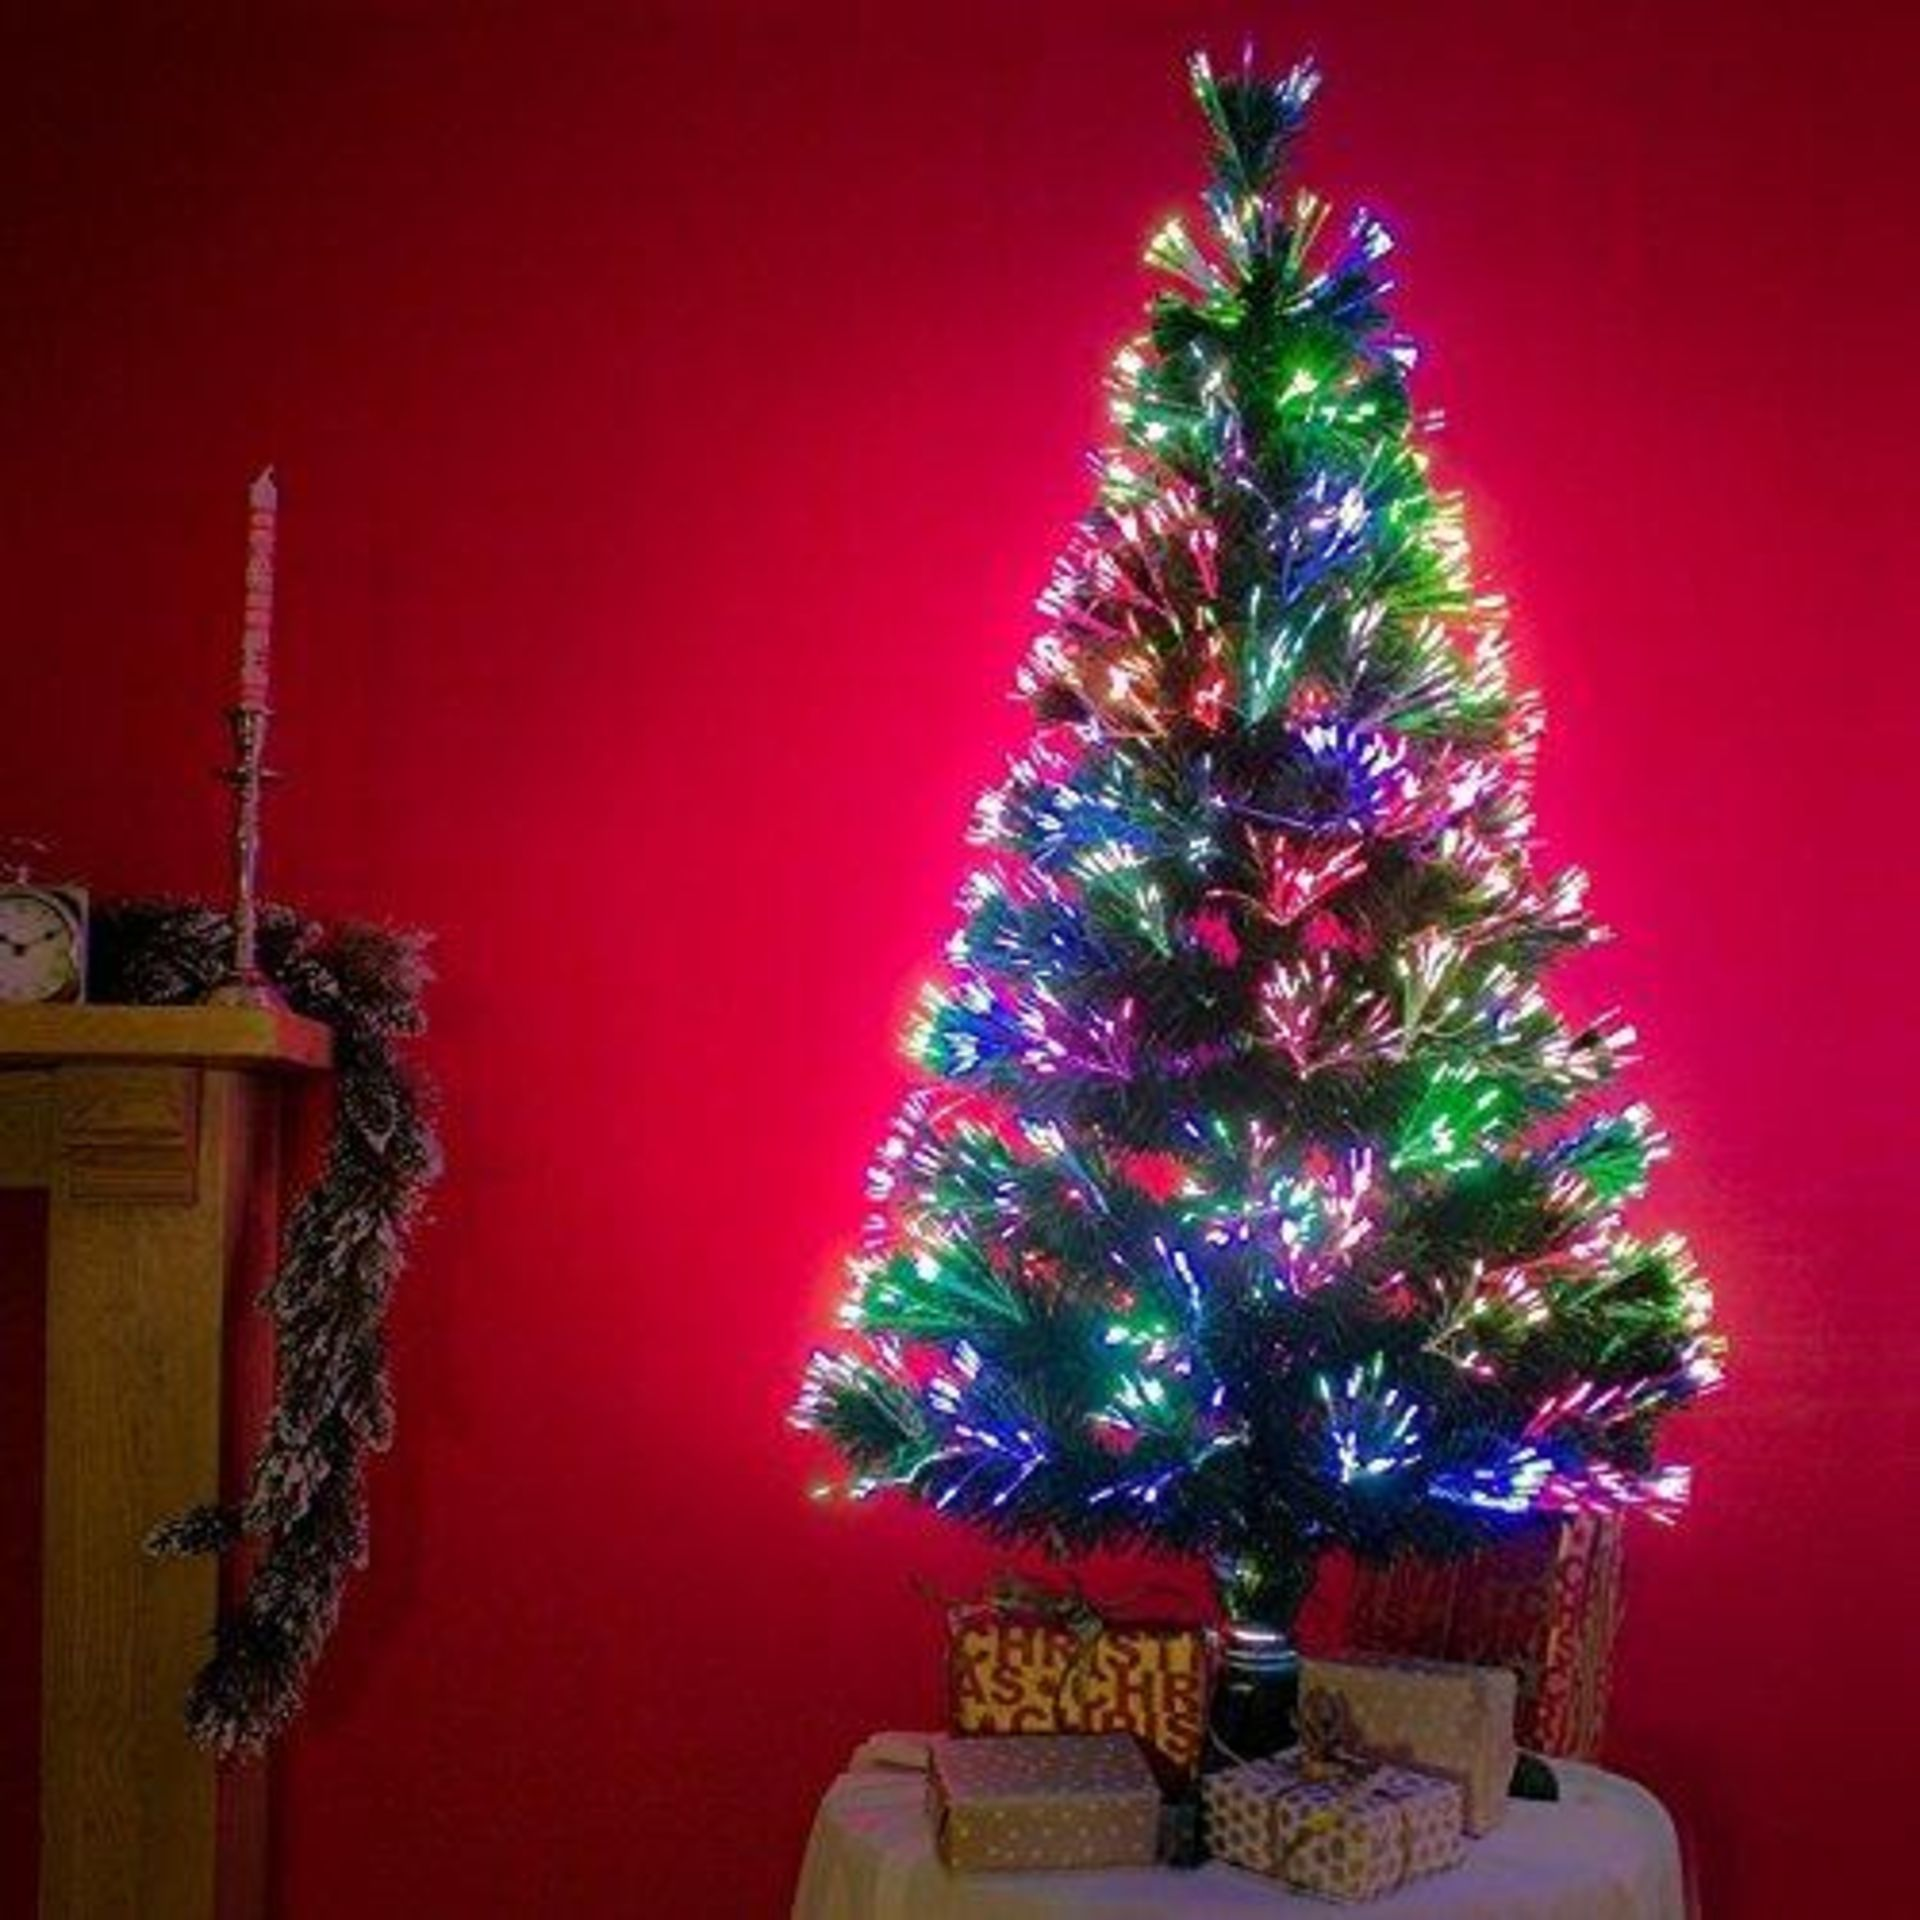 Lot 18004 - V Brand New 90CM Luxury Fibre Optic Christmas Tree With LEDs